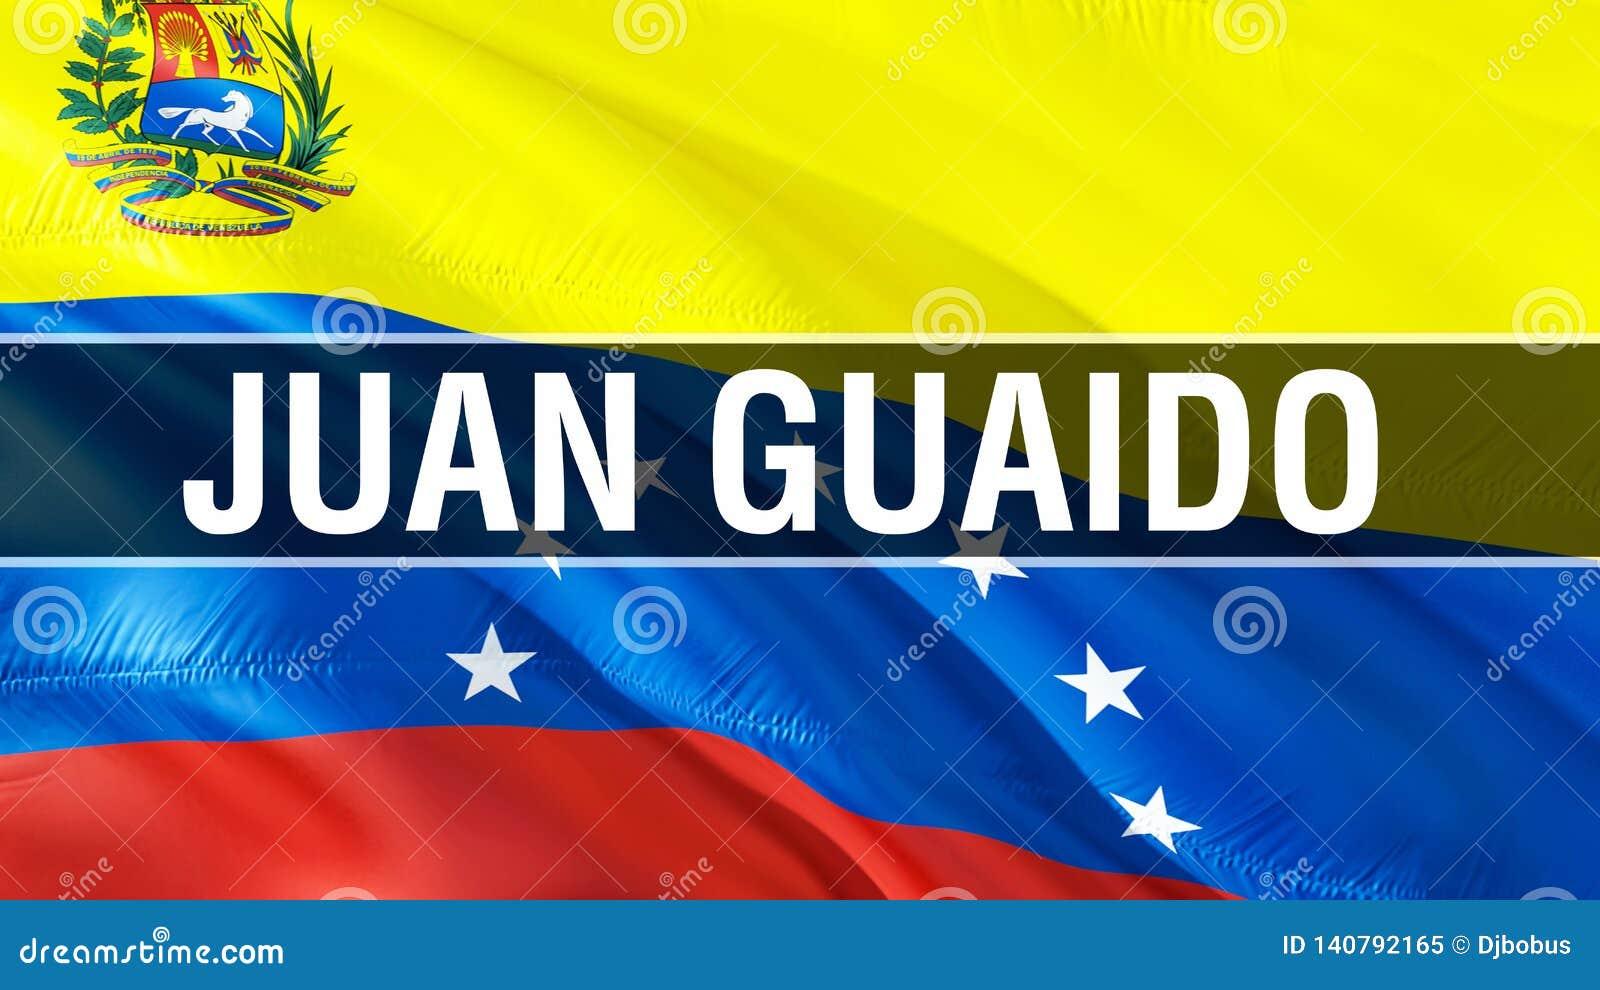 Juan Guaido on Venezuela flag. 3D Waving flag design. The national symbol of Venezuela, 3D rendering. National colors and National